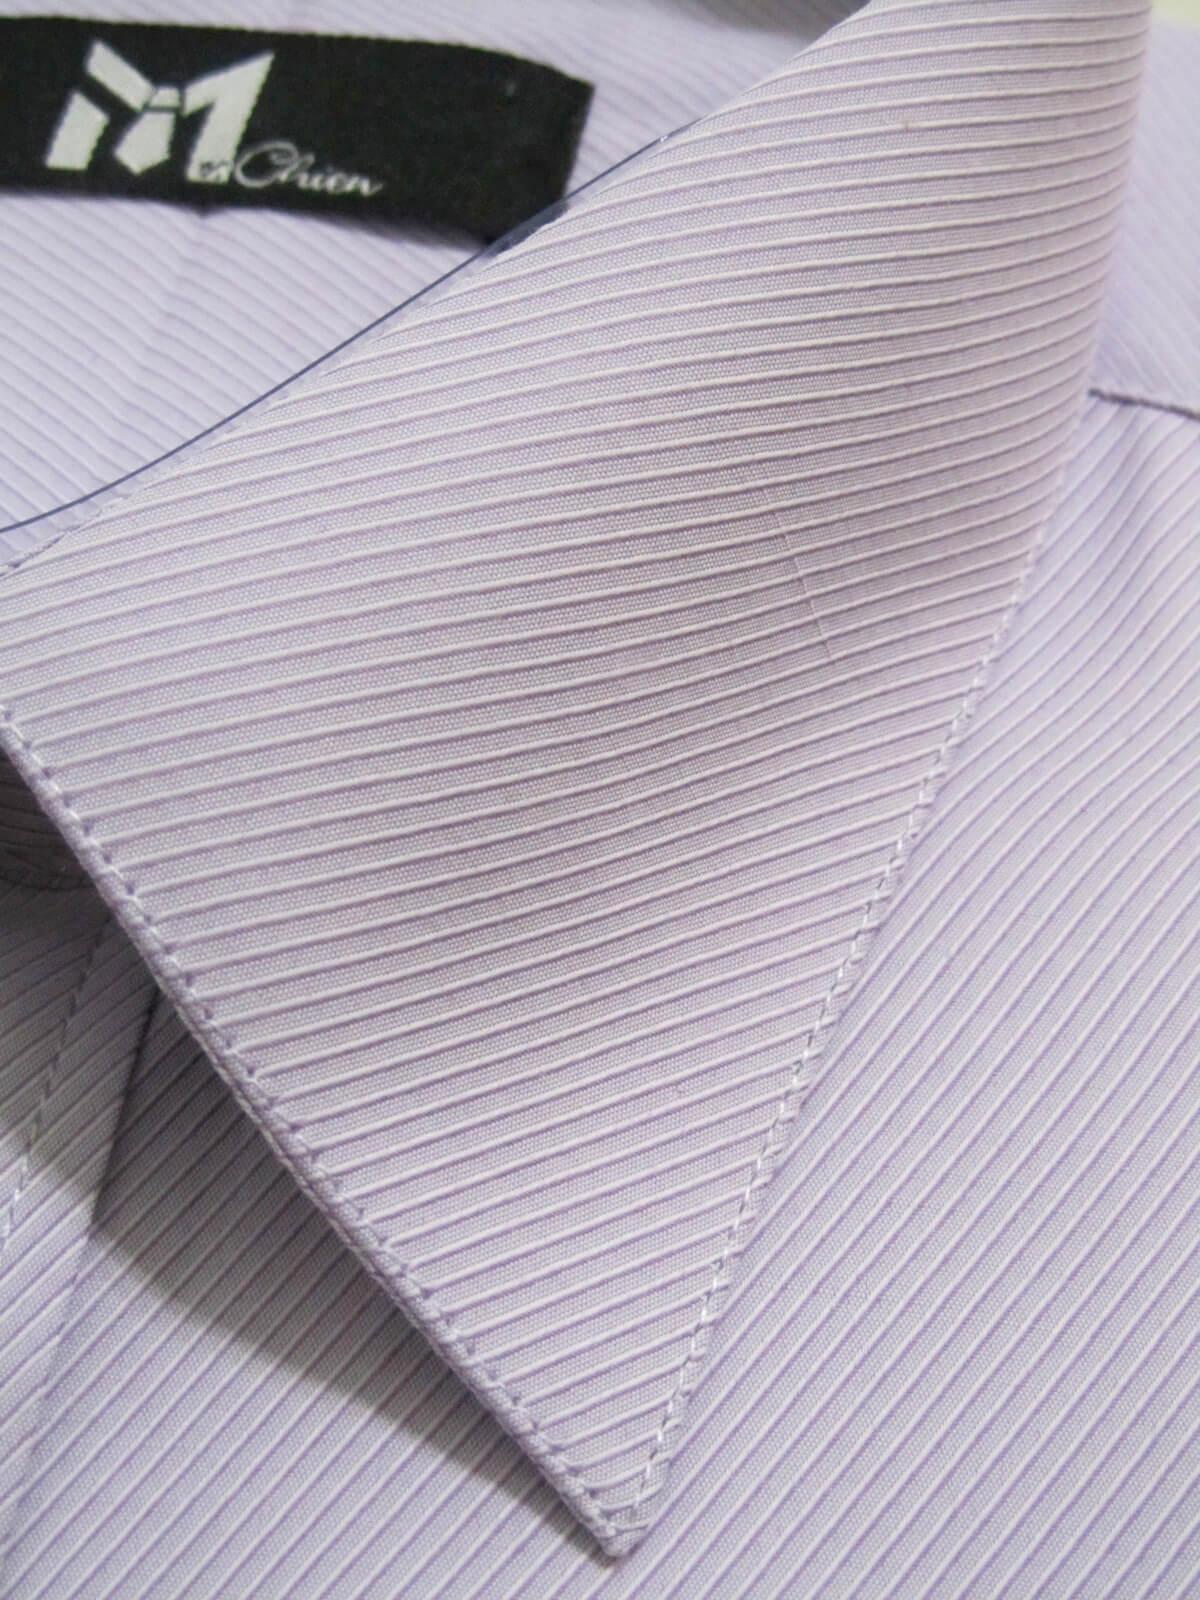 sun-e333特加大尺碼短袖條紋襯衫、上班族襯衫、標準襯衫、商務襯衫、正式場合襯衫、柔棉舒適襯衫、不皺免燙襯衫、細條紋襯衫(333-B518-01)白色斜條紋襯衫(333-B394-23)紫色斜條紋襯衫(333-B335-09)藍色直條紋襯衫 領圍:19.5、20.5、21.5、22.5 2